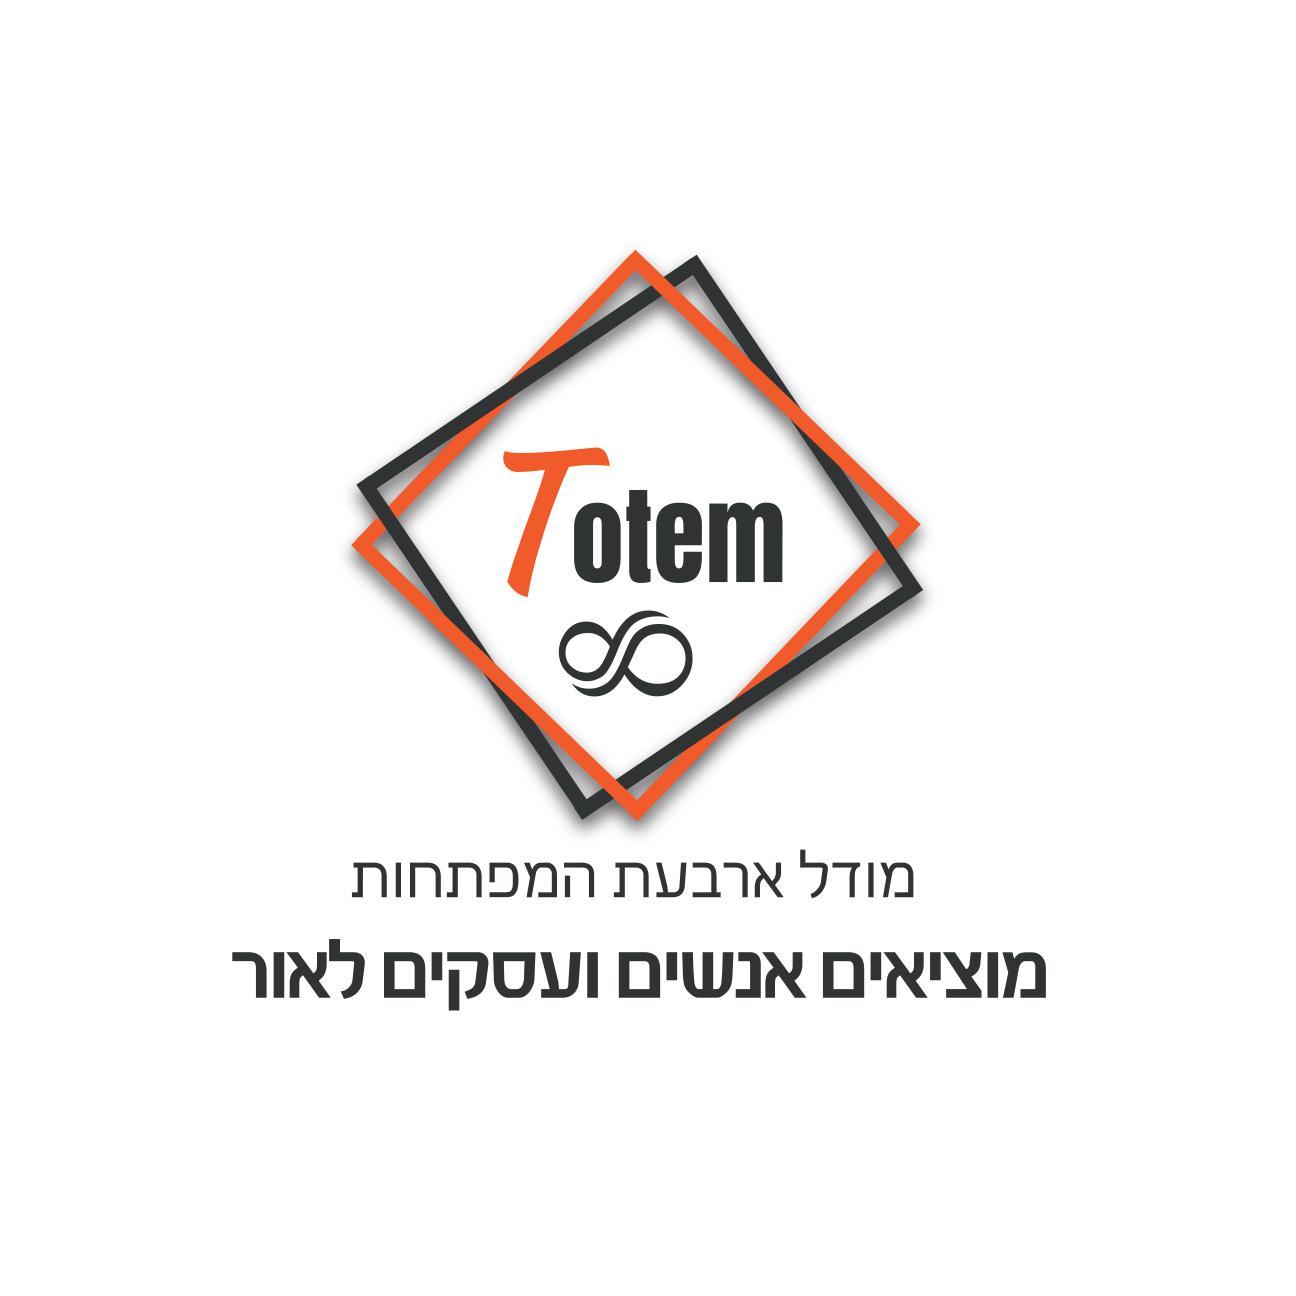 Totem - פיתוח אישי ועסקי מבוסס תשוקה